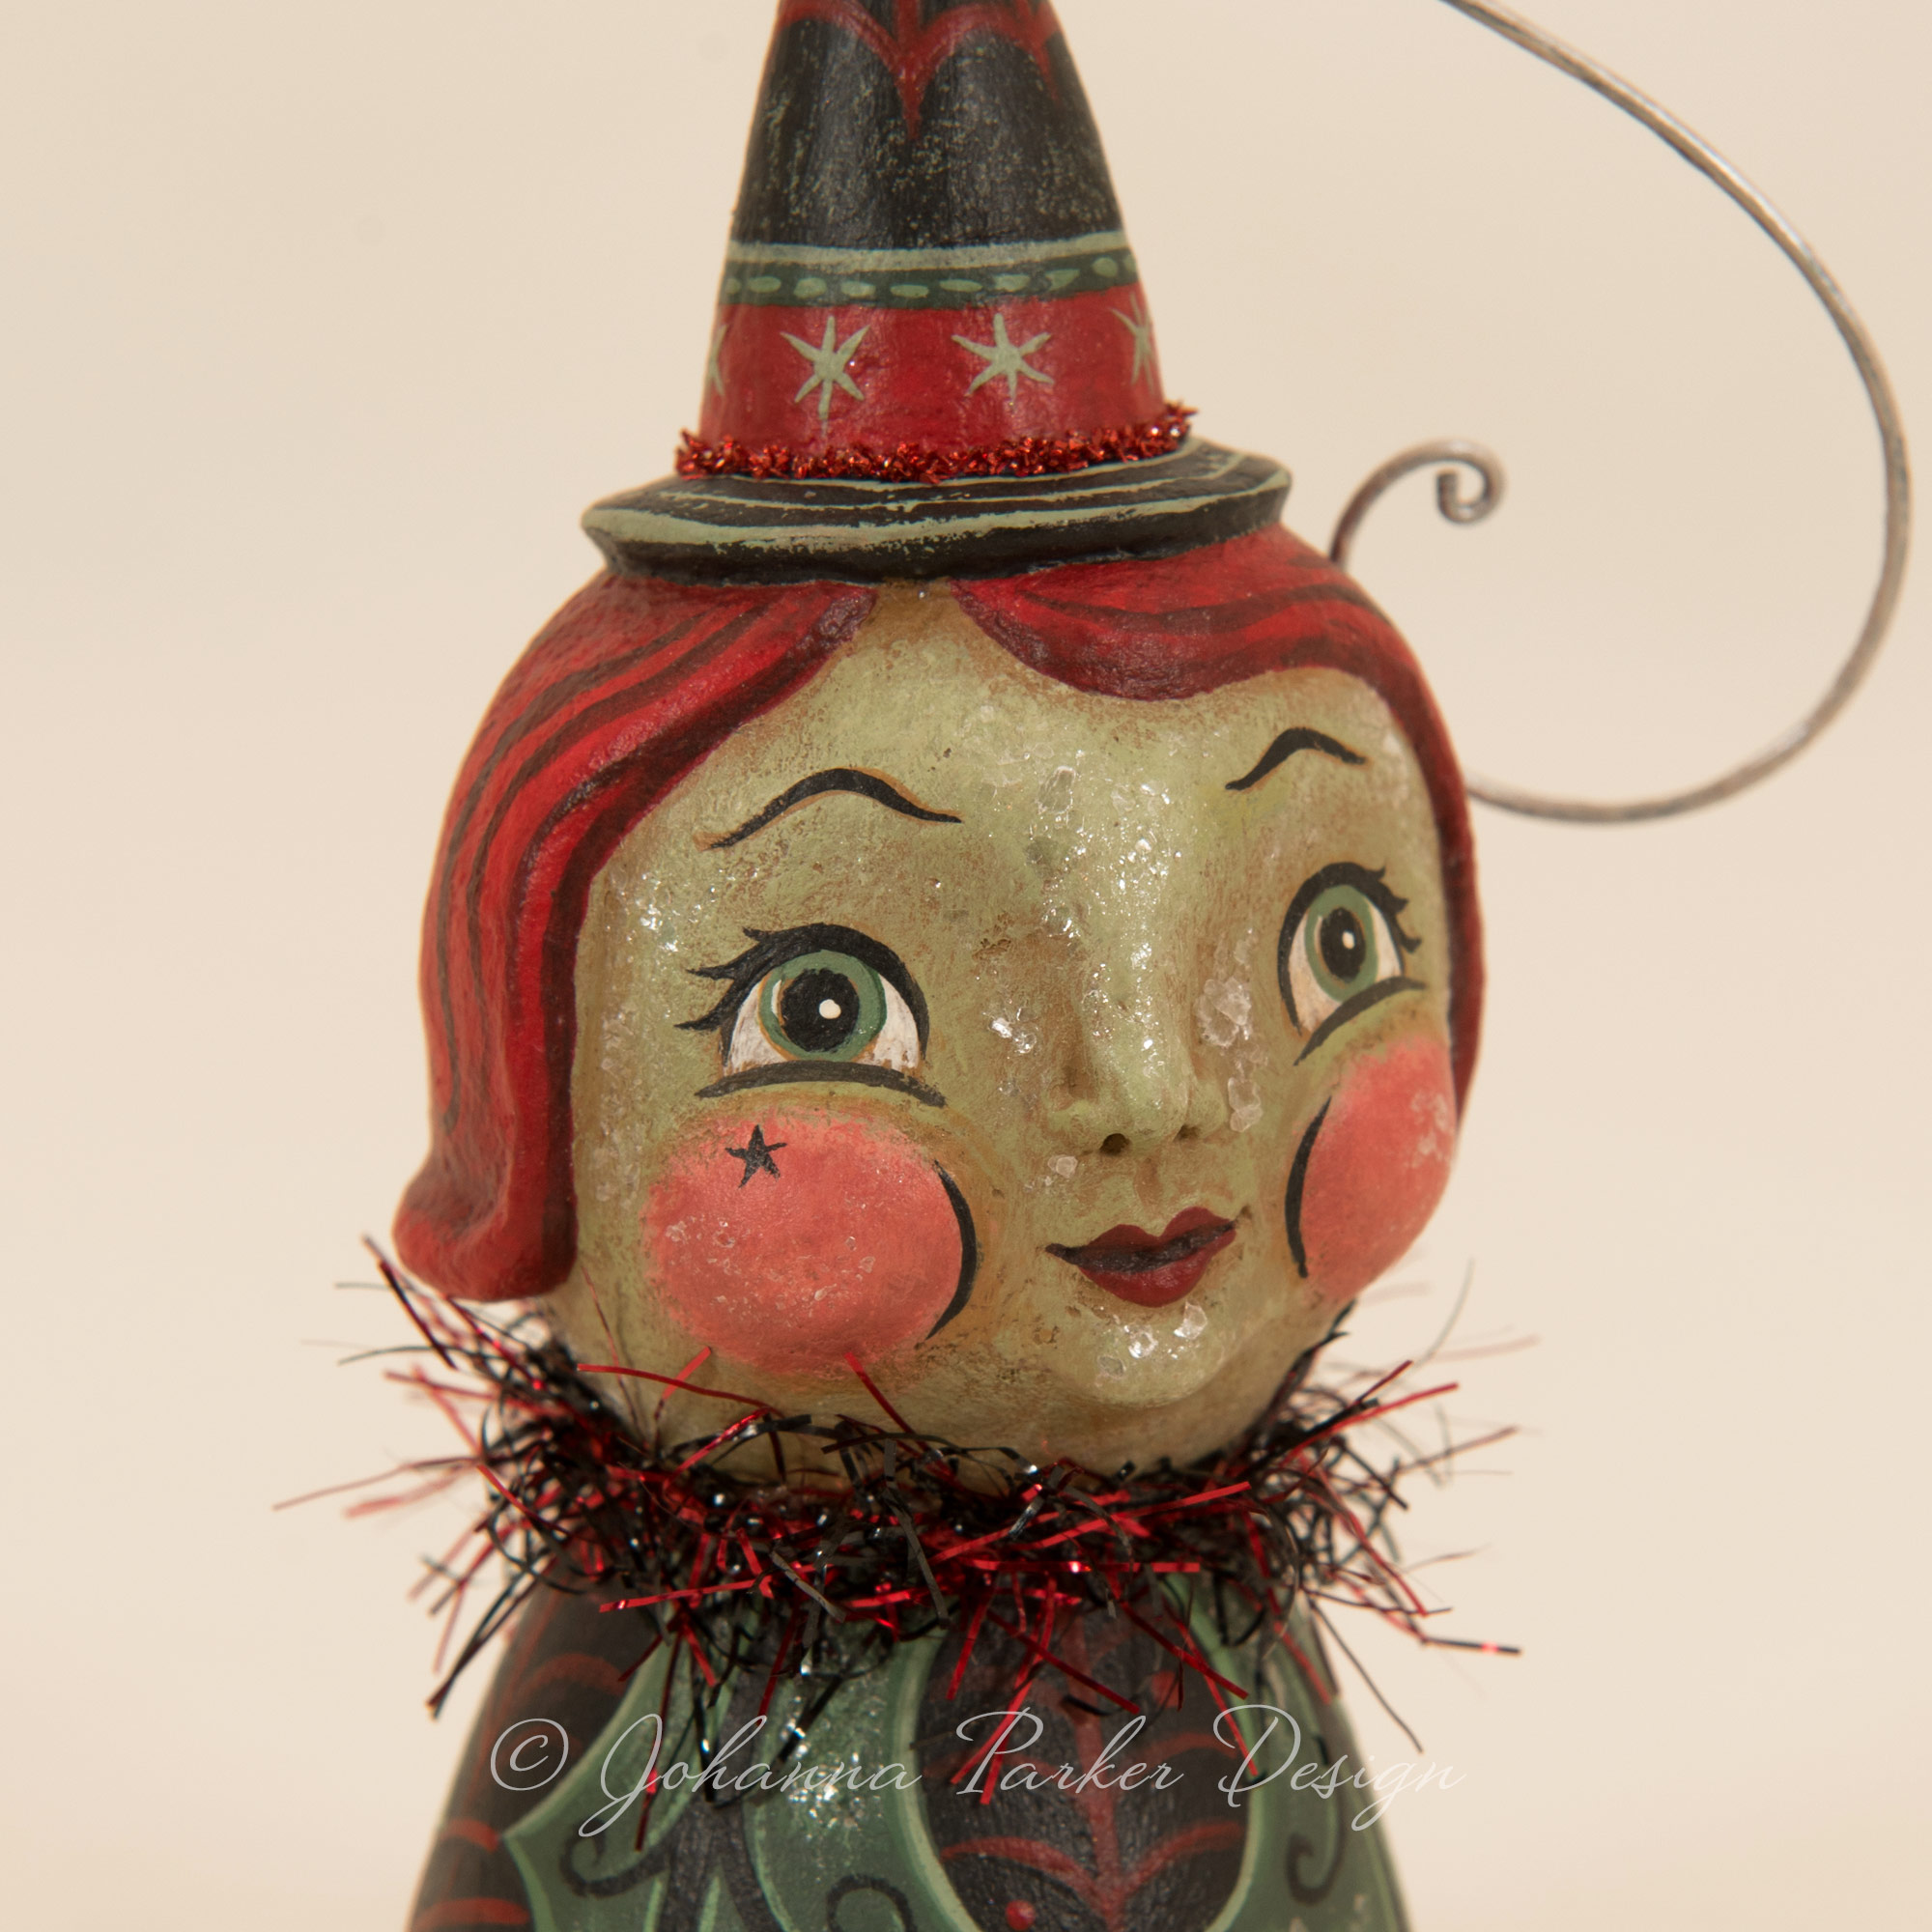 Johanna-Parker-Holly-Witch-Bell-Ornament-2.jpg